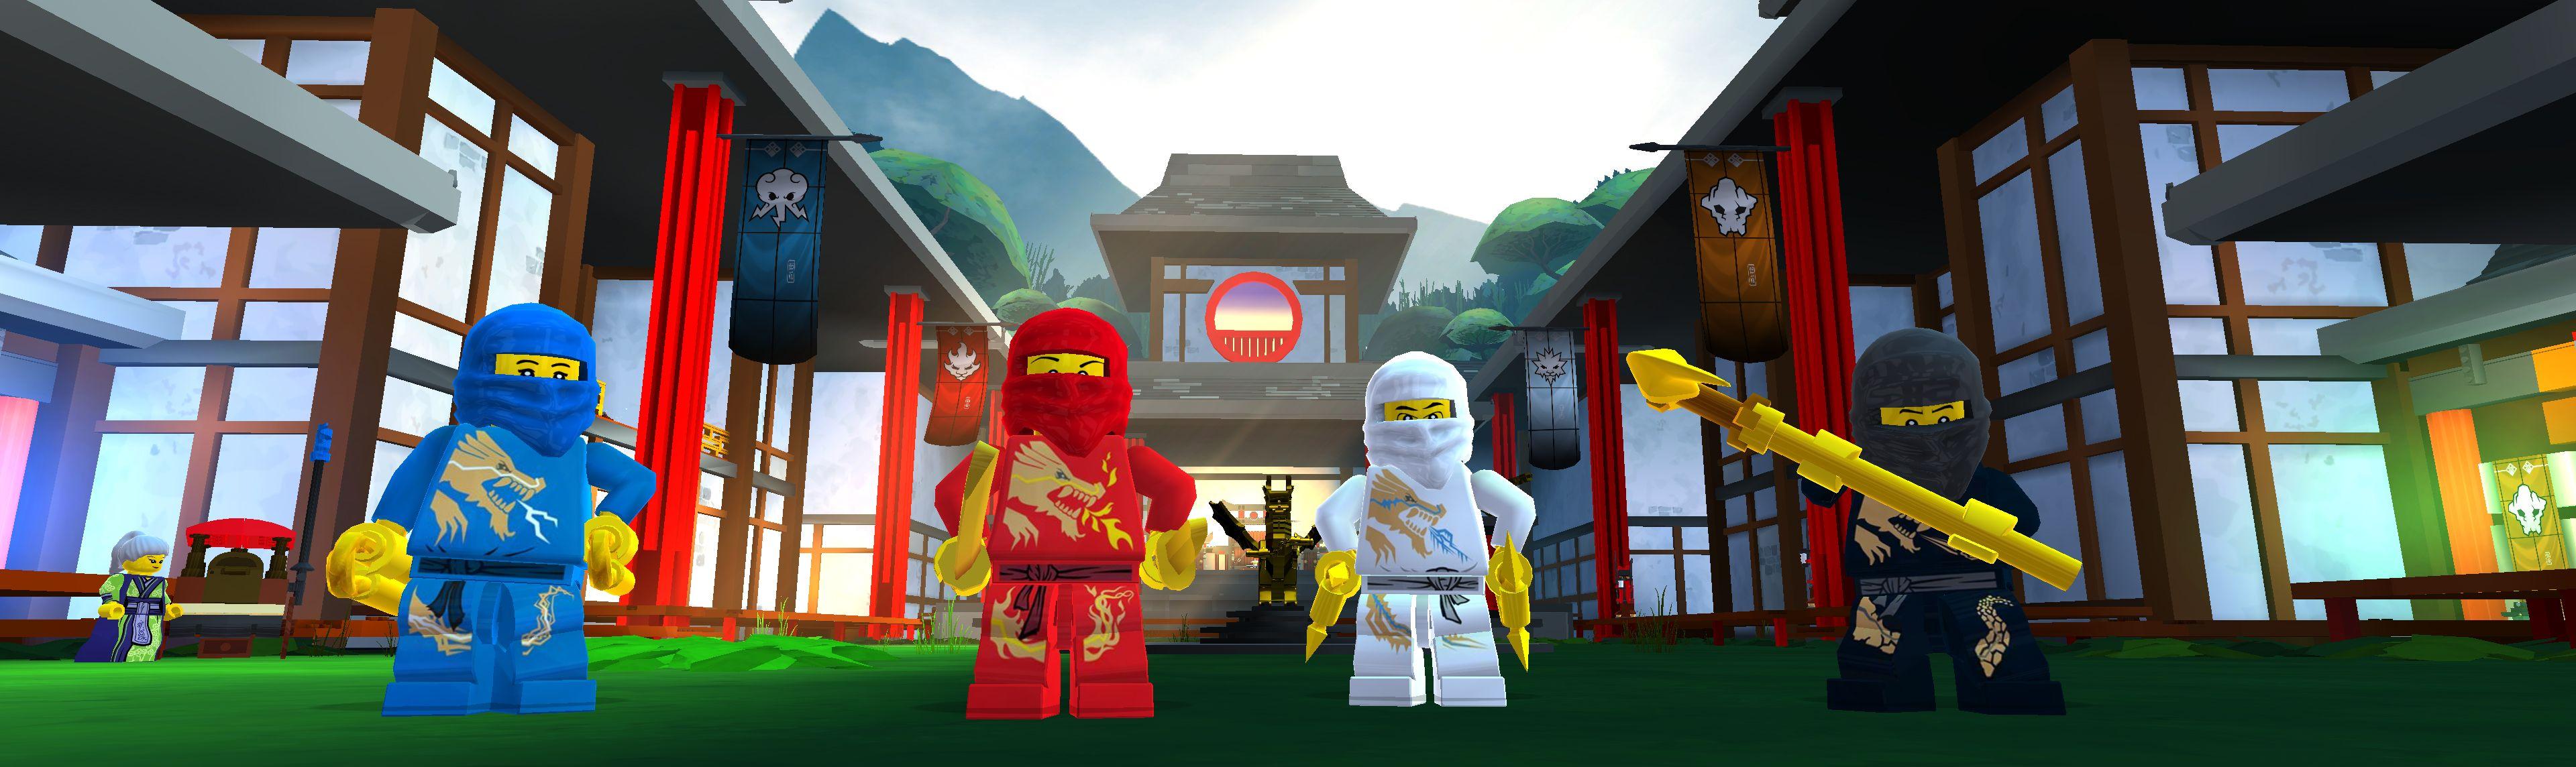 ninjago lego games online free